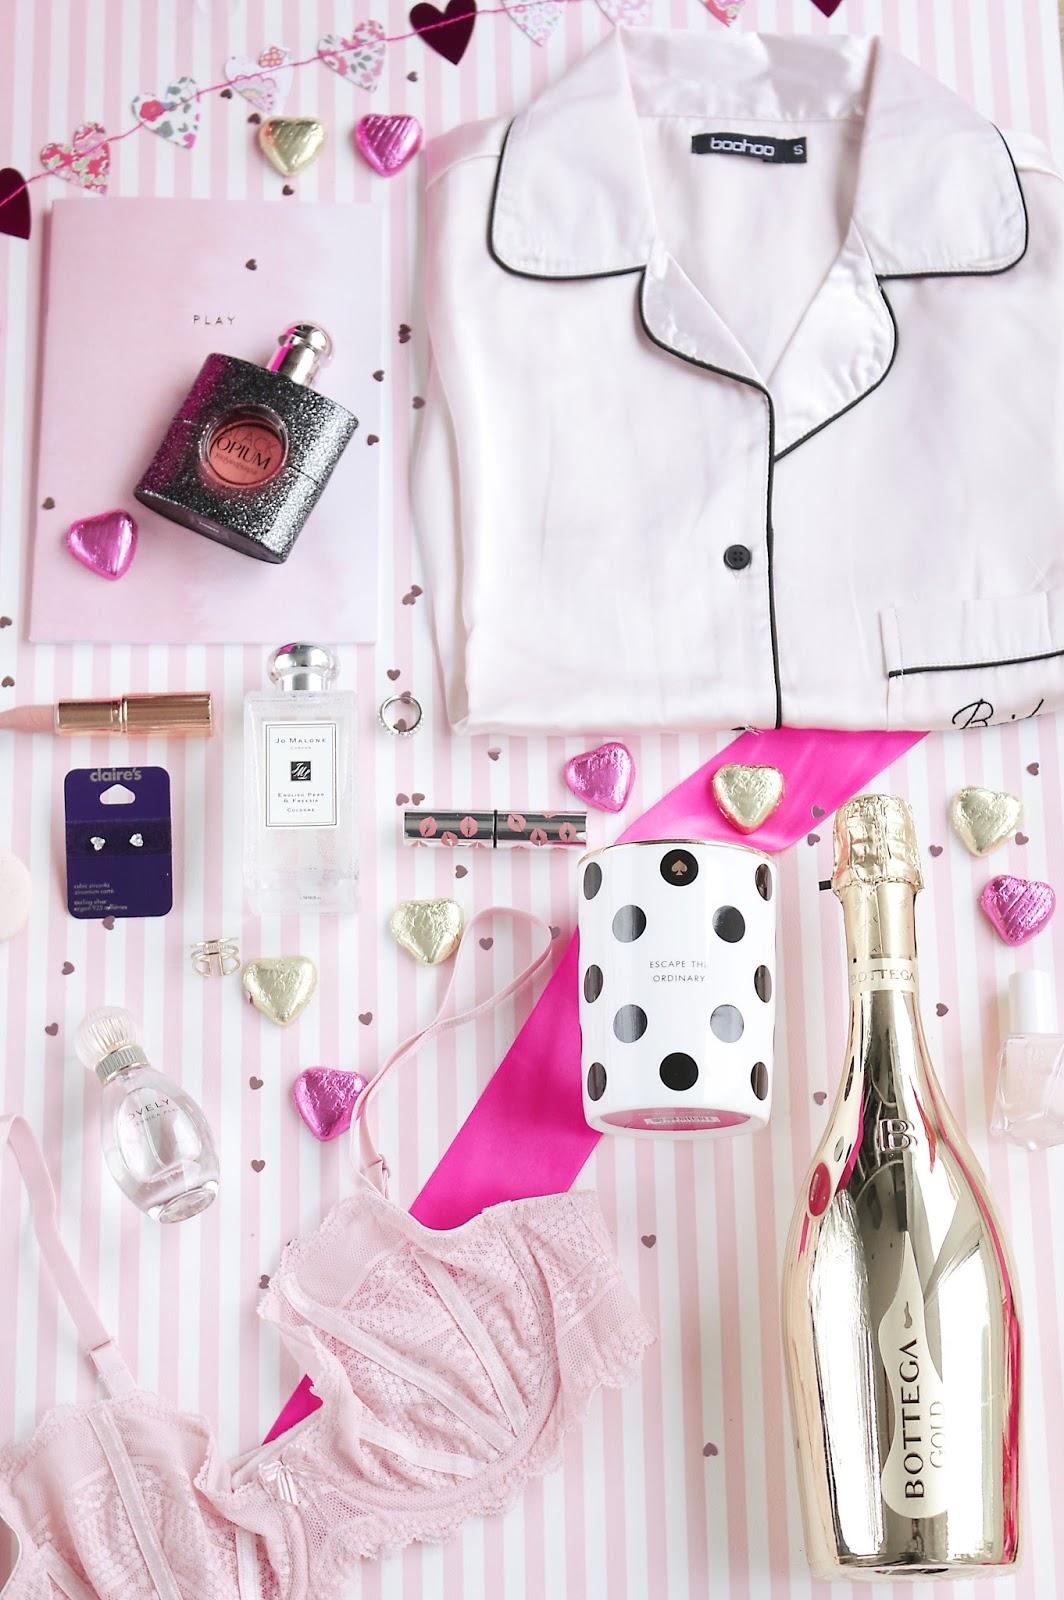 Lifestyle, Valentine's day, Valentine's Gift Guide, Gift Guide, what to buy for valentines day, gifts for valentines day, what to buy your girlfriend for valentines day, kate spade, bottega, charlotte tilbury,